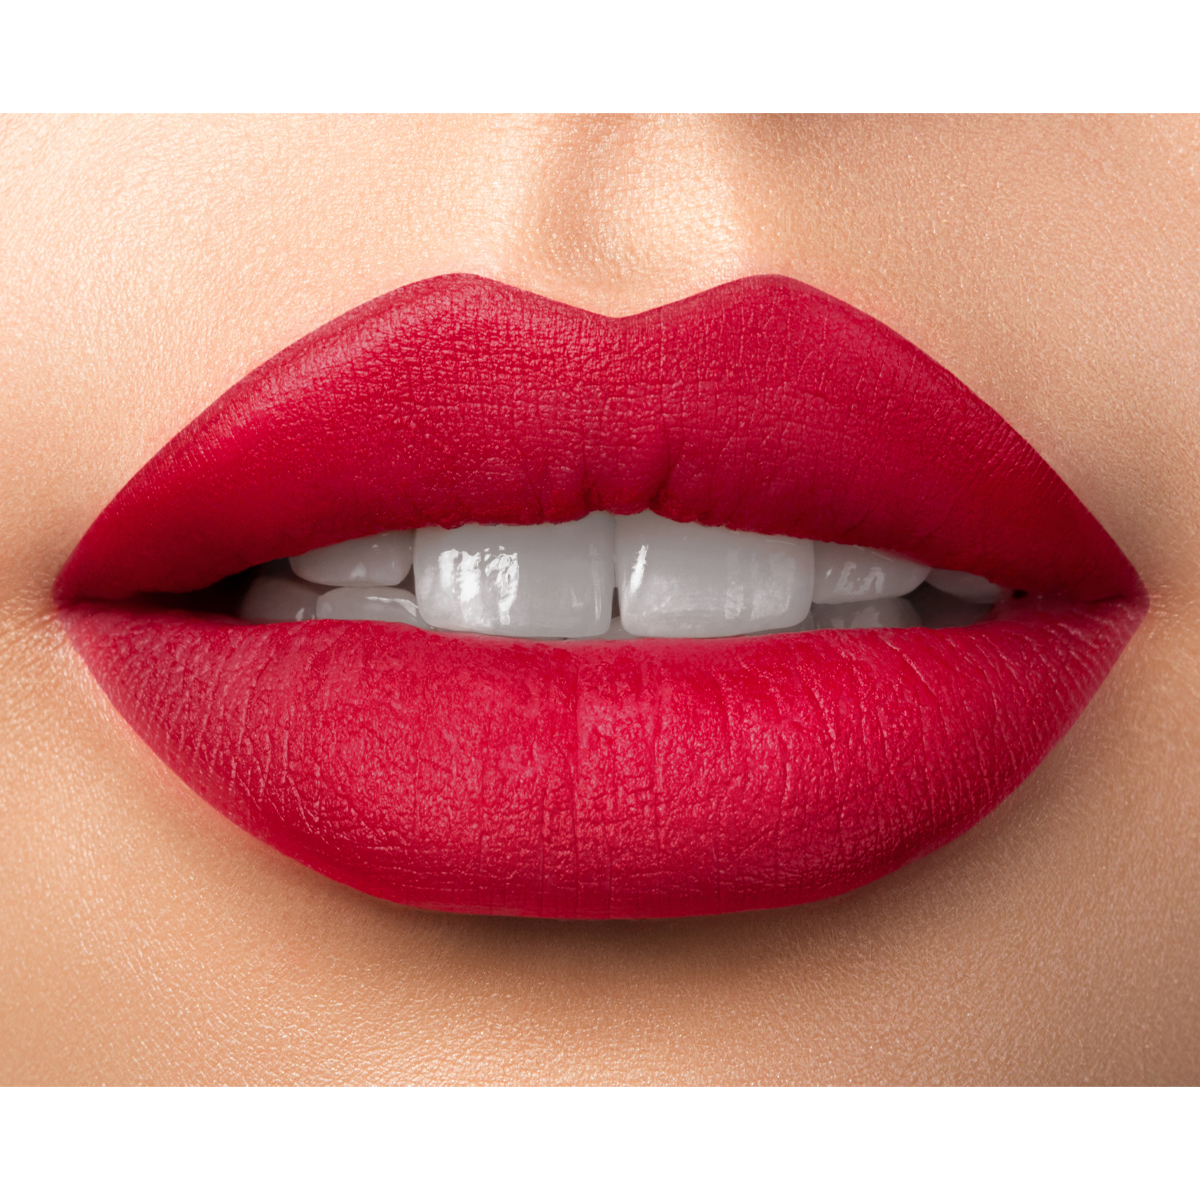 Durable Lip Contour - Into the Fire